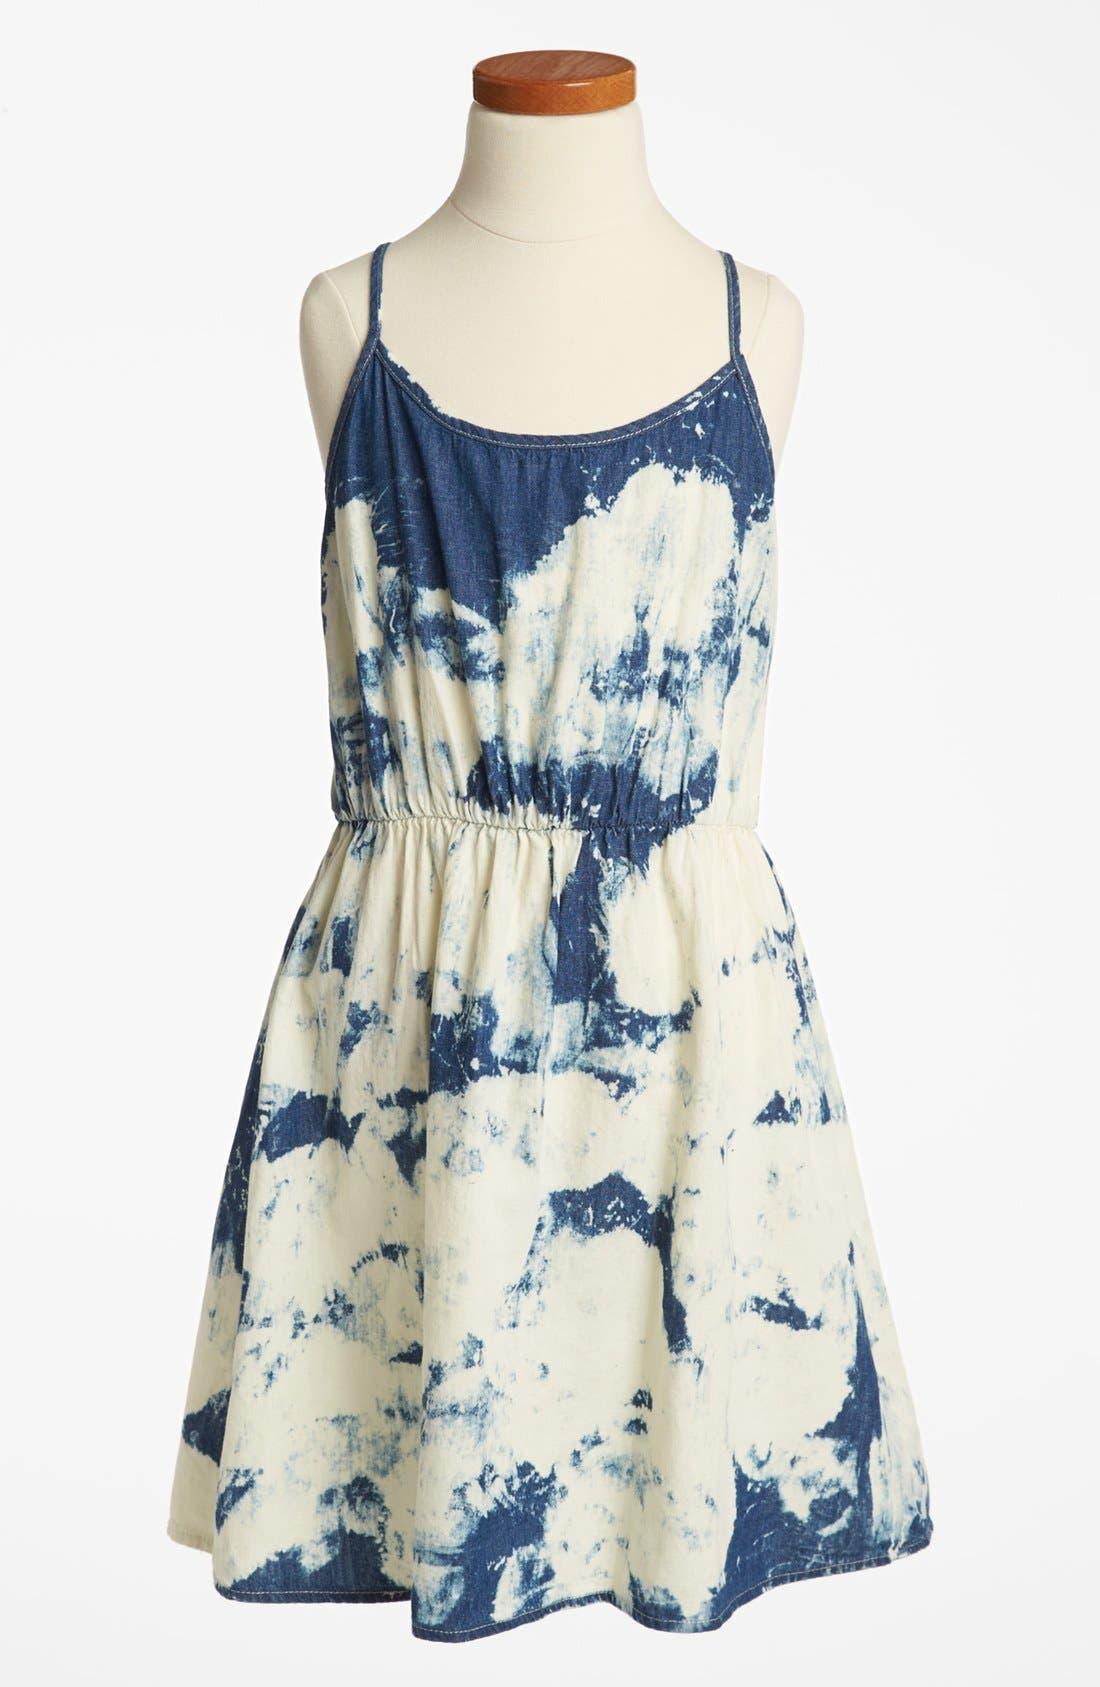 Alternate Image 1 Selected - Mia Chica Acid Wash Chambray Dress (Big Girls)